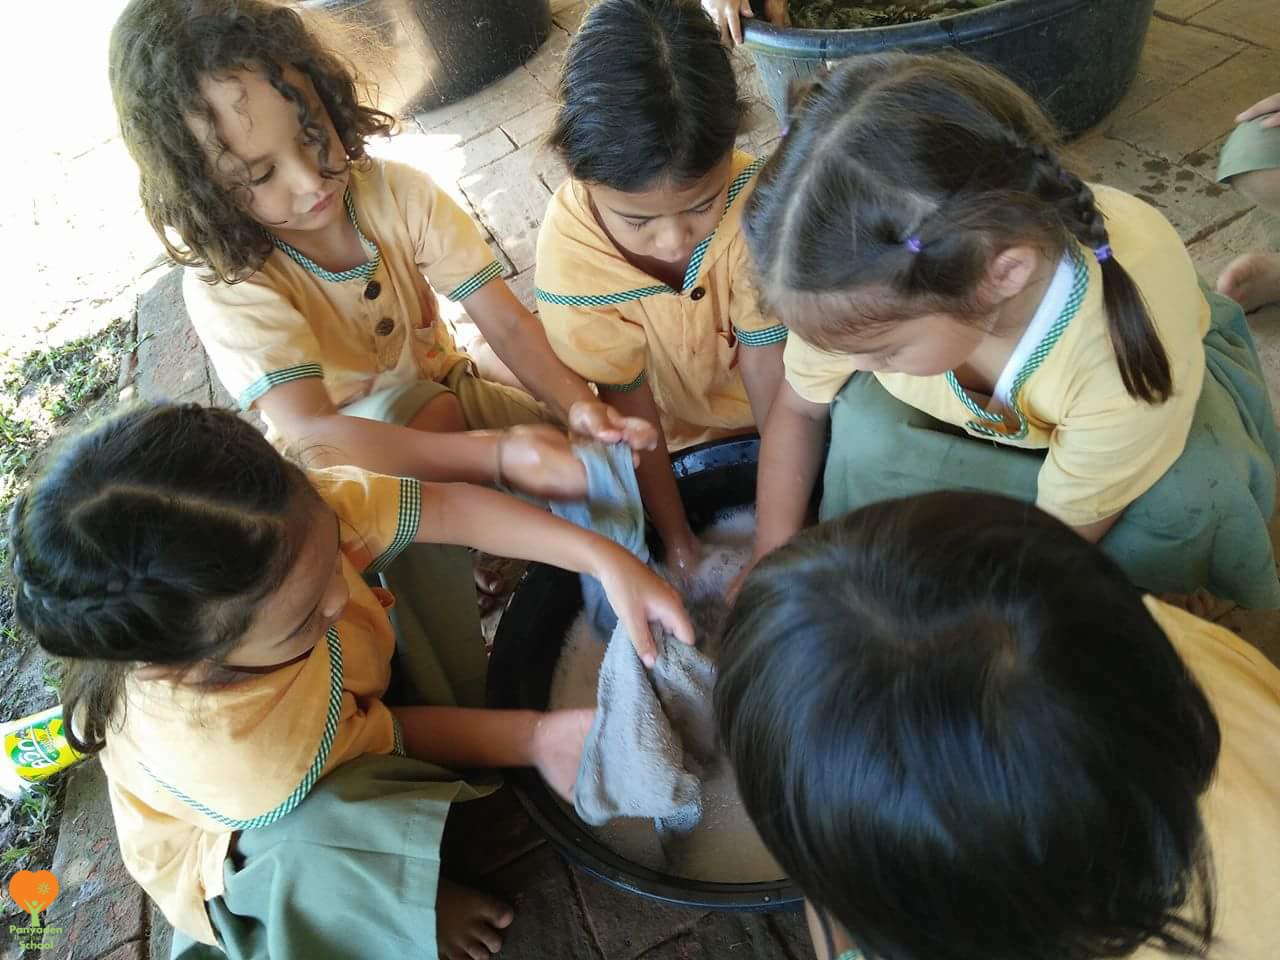 Year 1 students washing towels at school, Panyaden International School Life Skills class